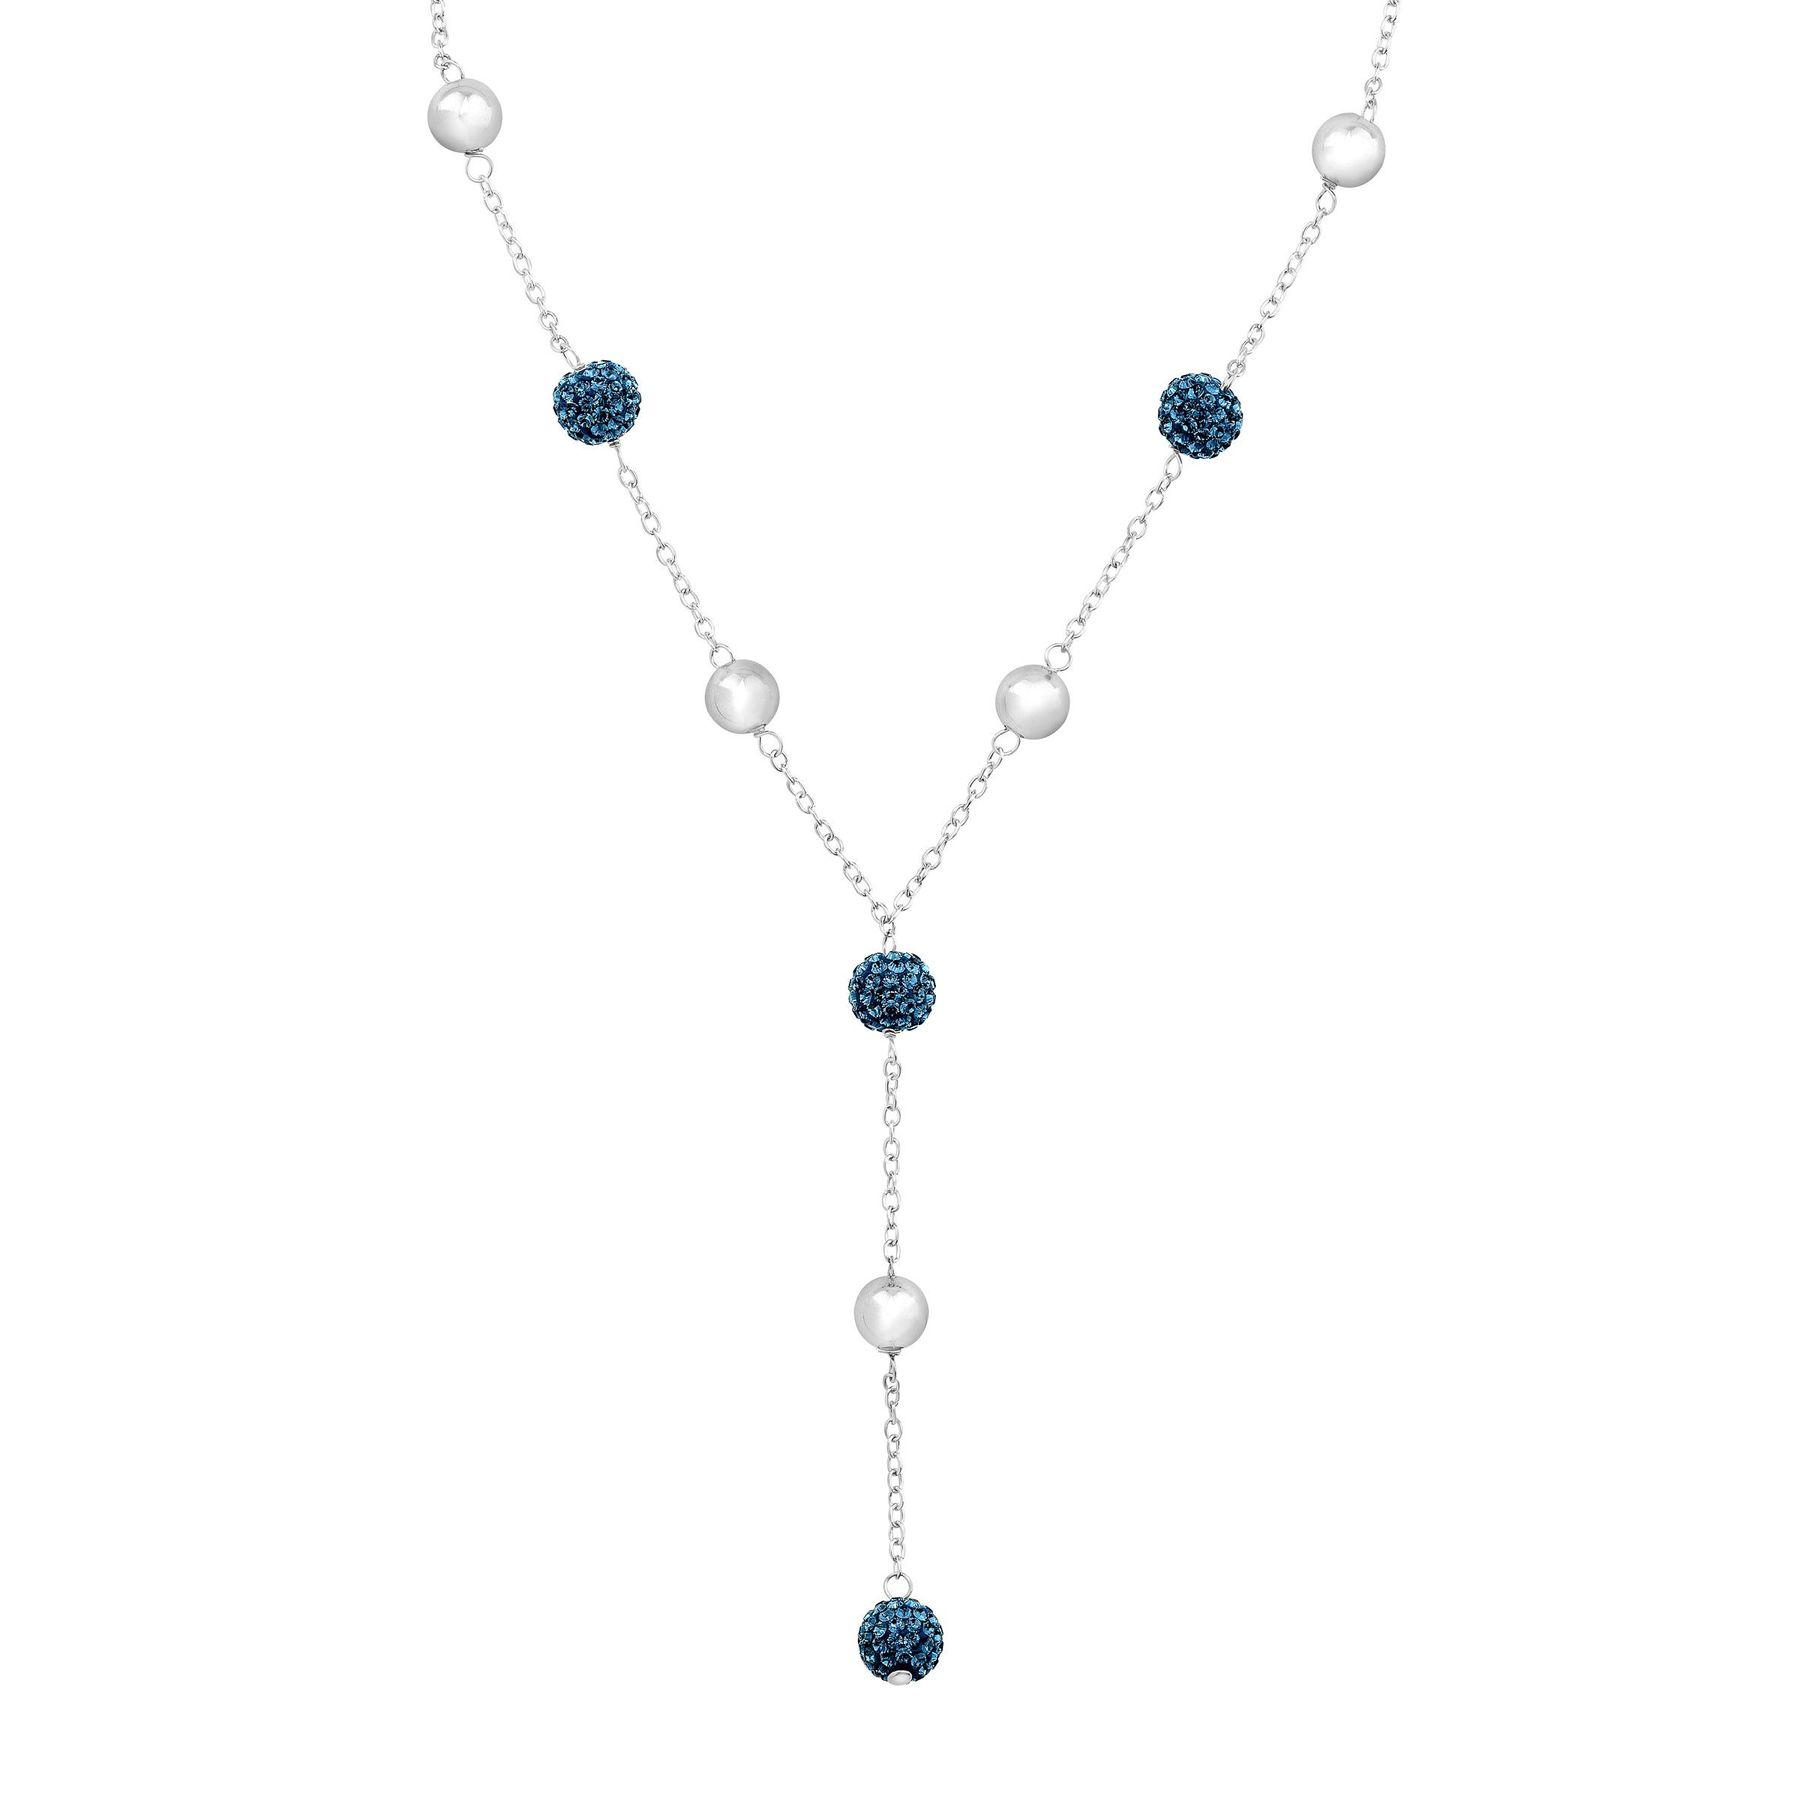 Crystaluxe Lariat Necklace with Montana Blue Swarovski Crystals in ... 02de953420